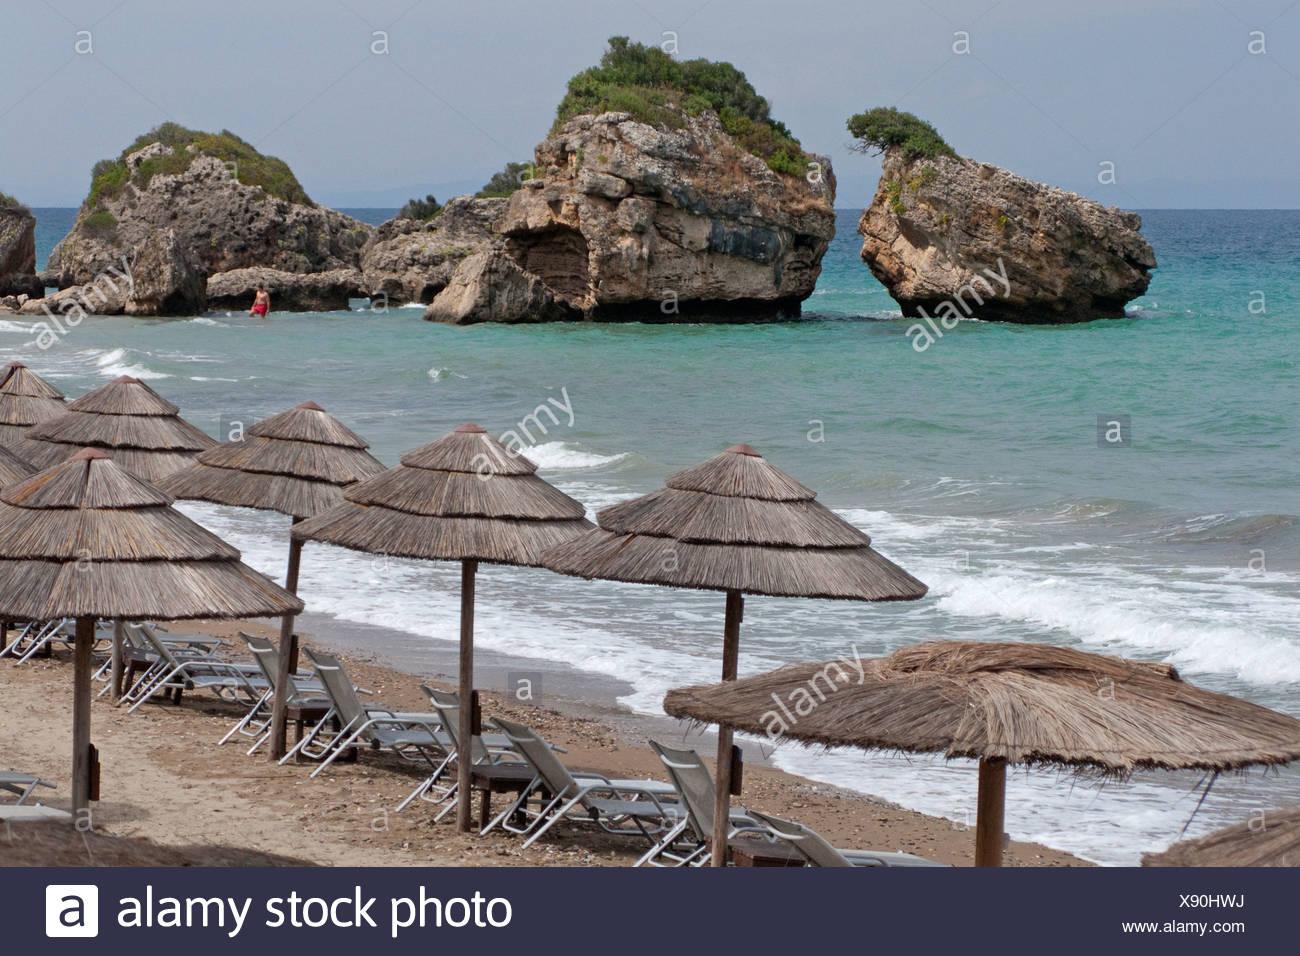 Sunshades and sun loungers on the beach of Porto Zoro, Zakynthos island, Greece, Europe - Stock Image